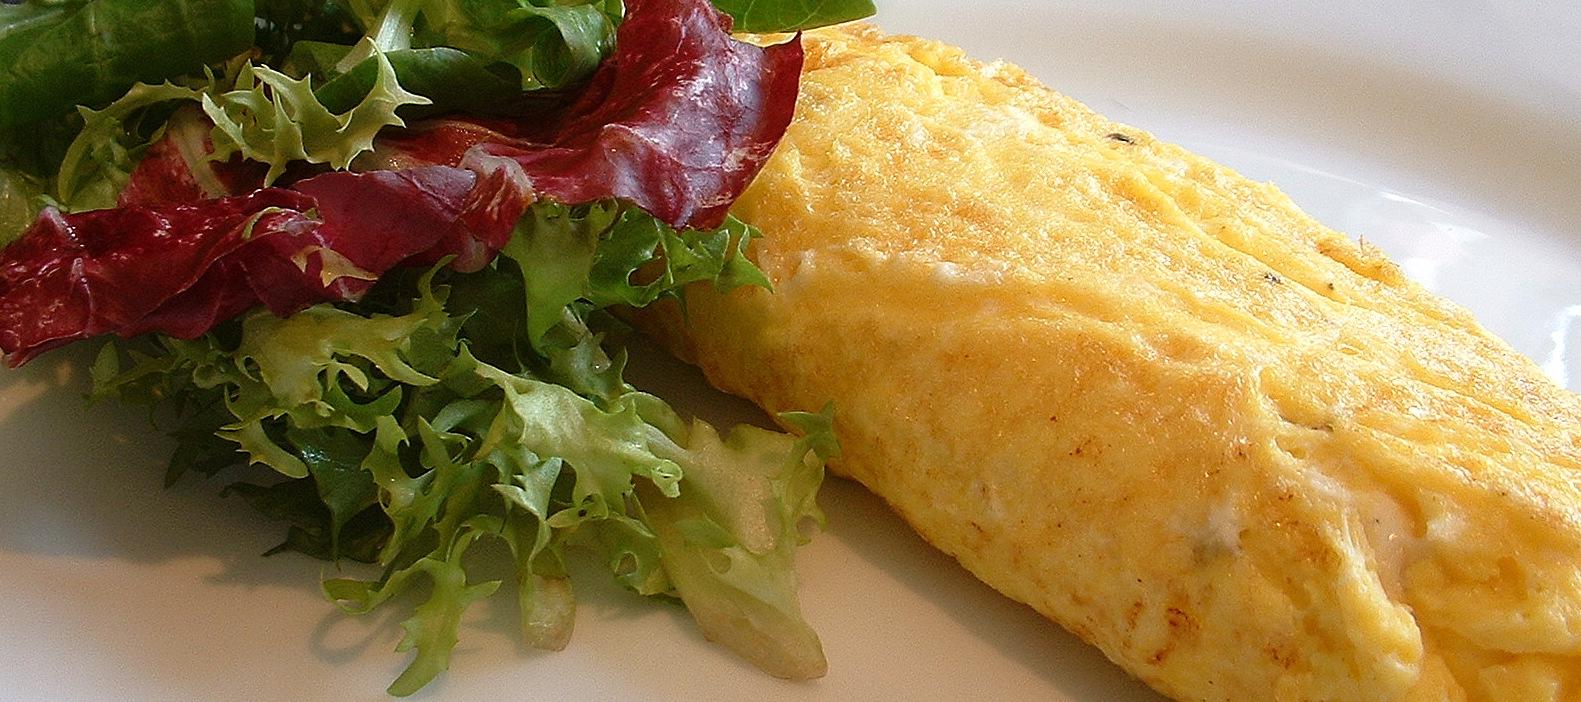 Plain omelette recipe | Omelette recipe | Omelet recipe